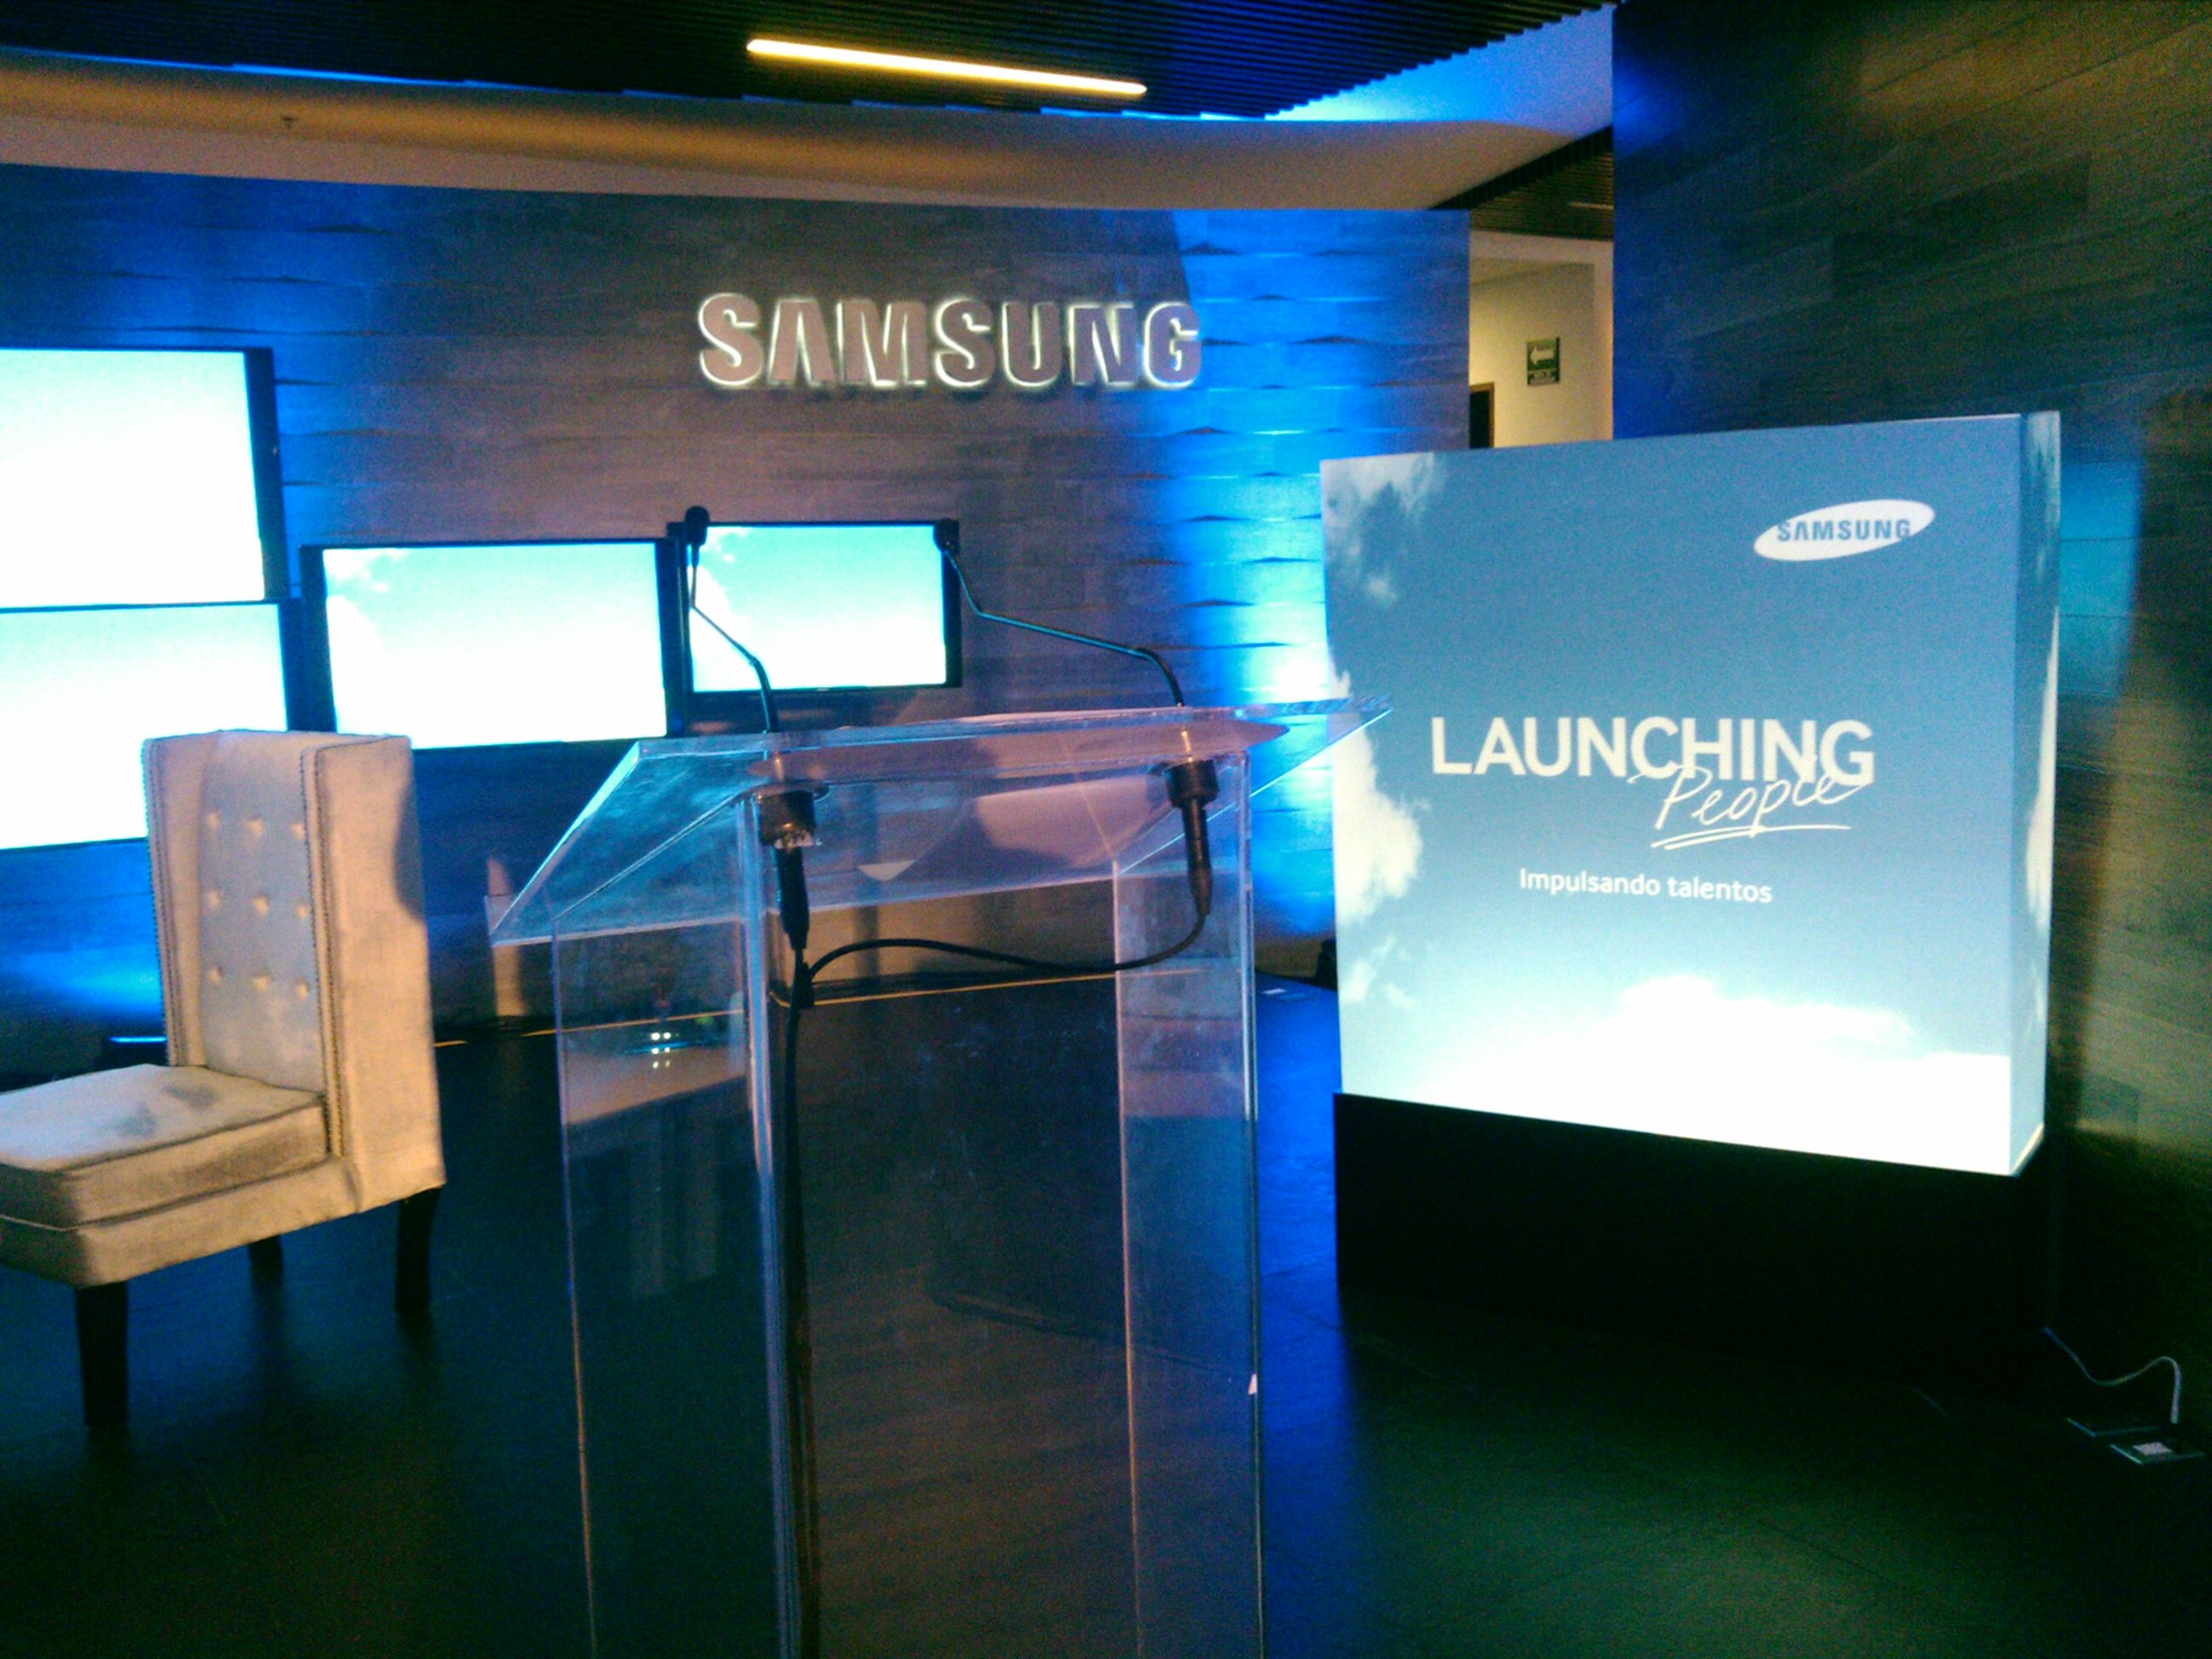 Caja de luz Lightbox #Branding #Samsung | Branding SAMSUNG ... for Light Box Branding  59dqh